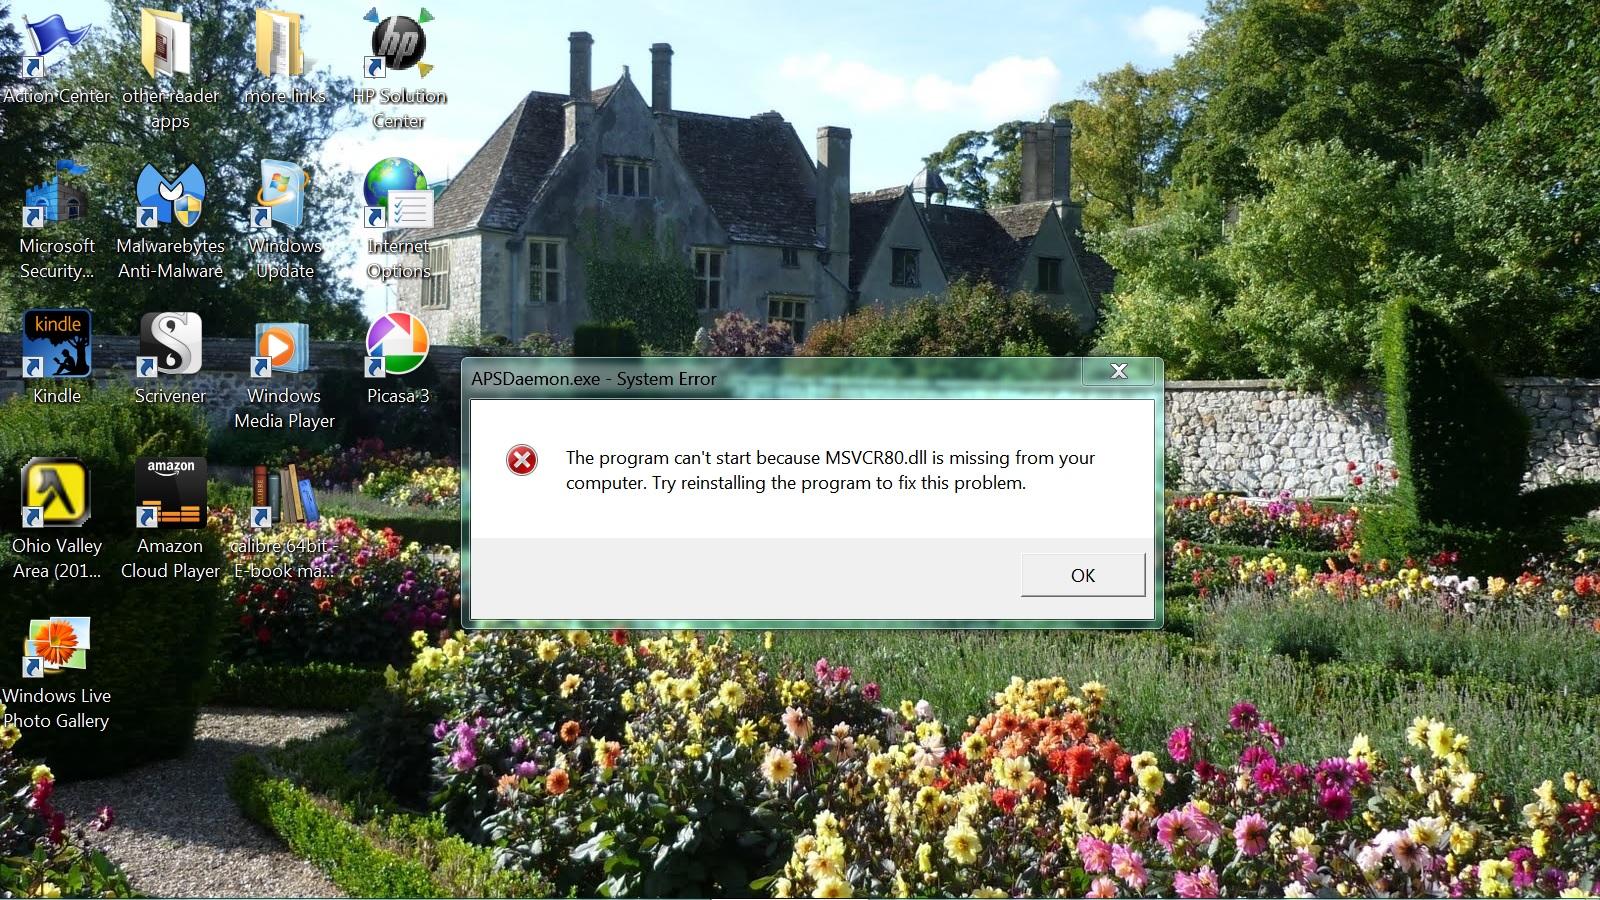 How to remove APSDaemon.exe - Apple Community